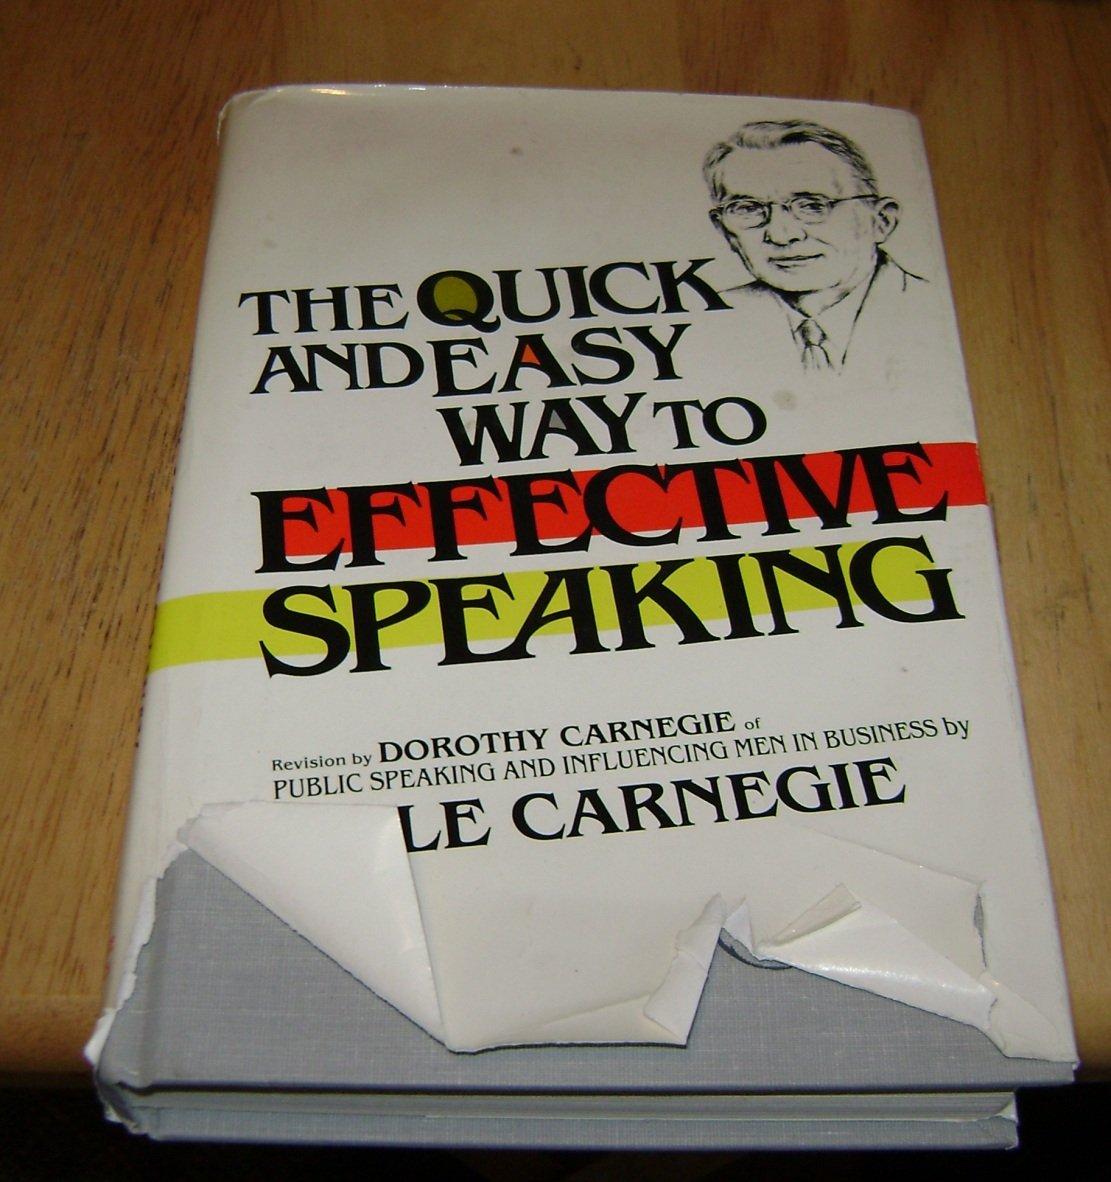 Qucik & easy way to effective speaking Dale Carnegie HC